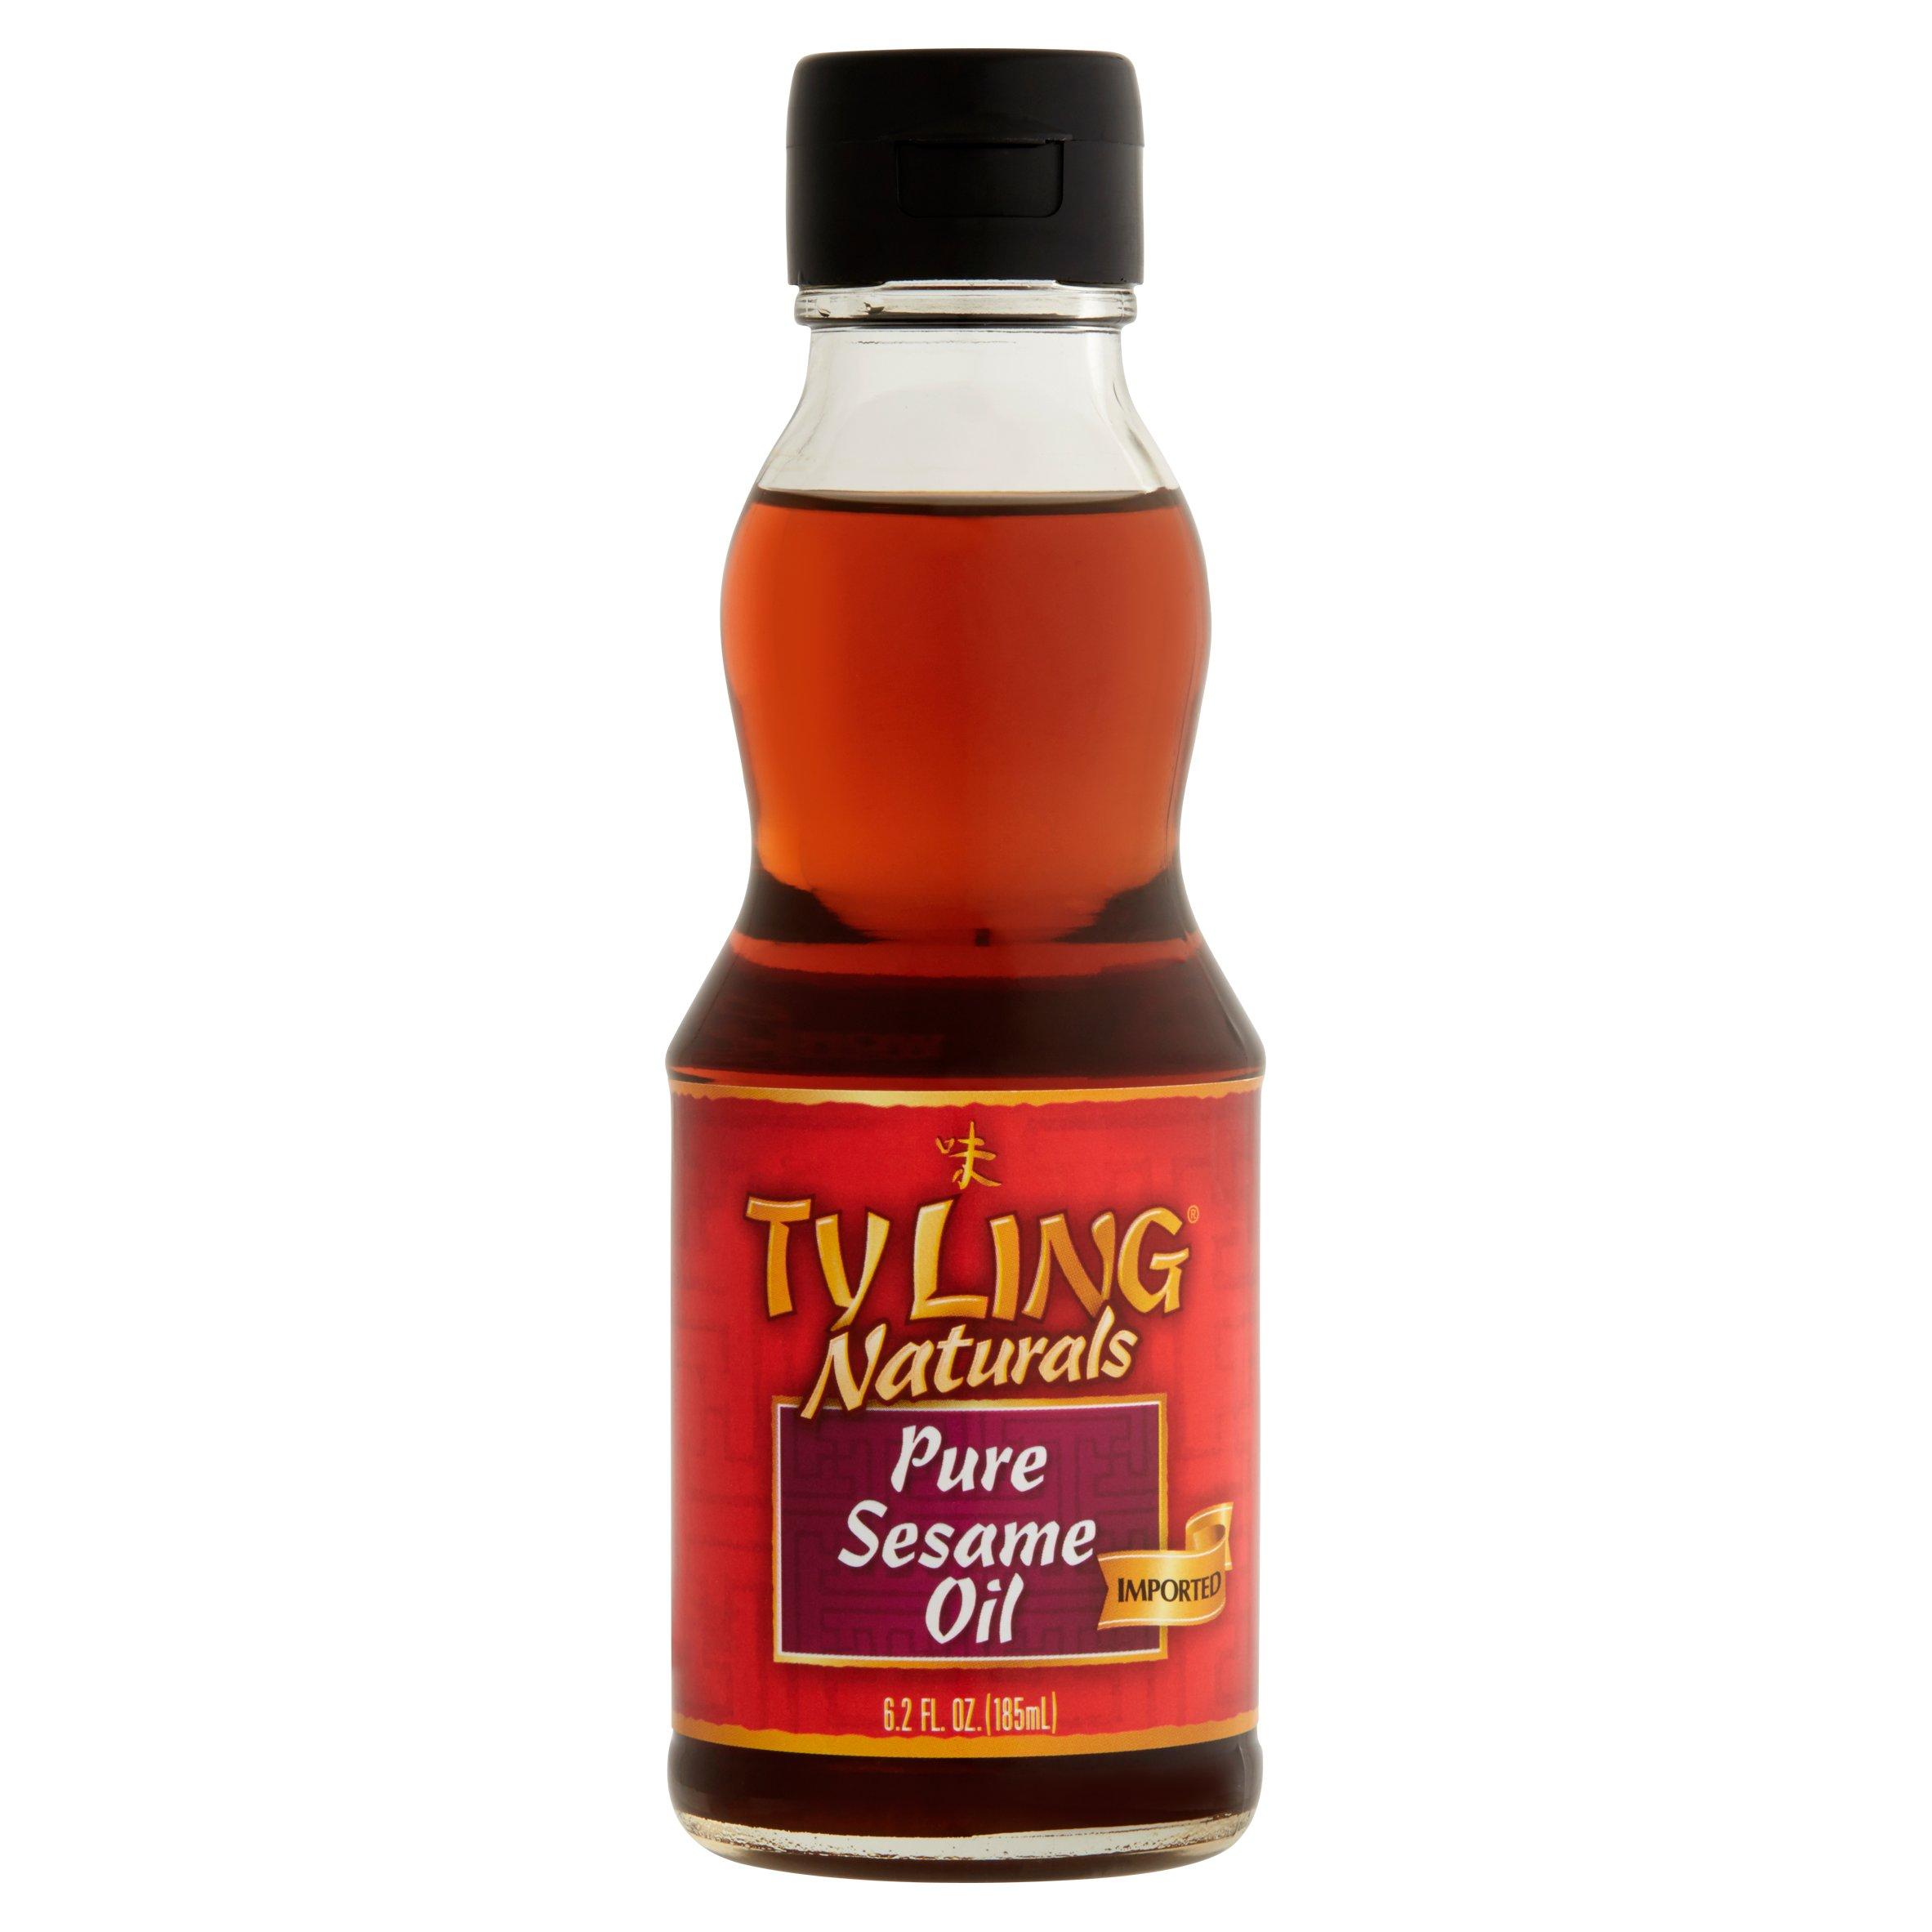 Ty Ling Naturals Pure Sesame Oil, 6.2 fl oz